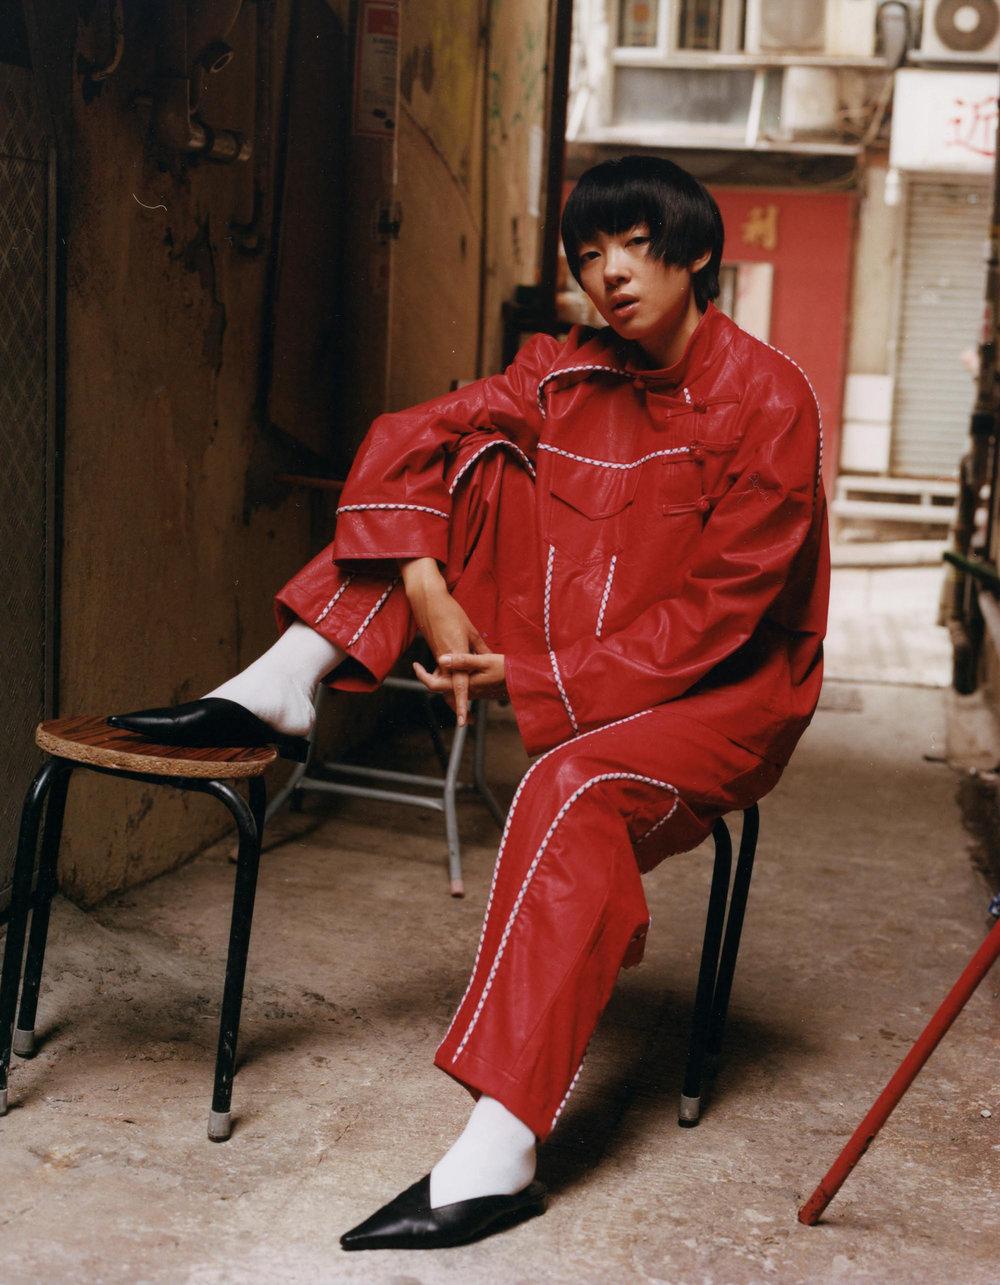 Fashion by  SK Tang  Photography by  Olya Oleinic  Model  Yushukpui Bobby  Makeup Artist  Ka Ho Cheng